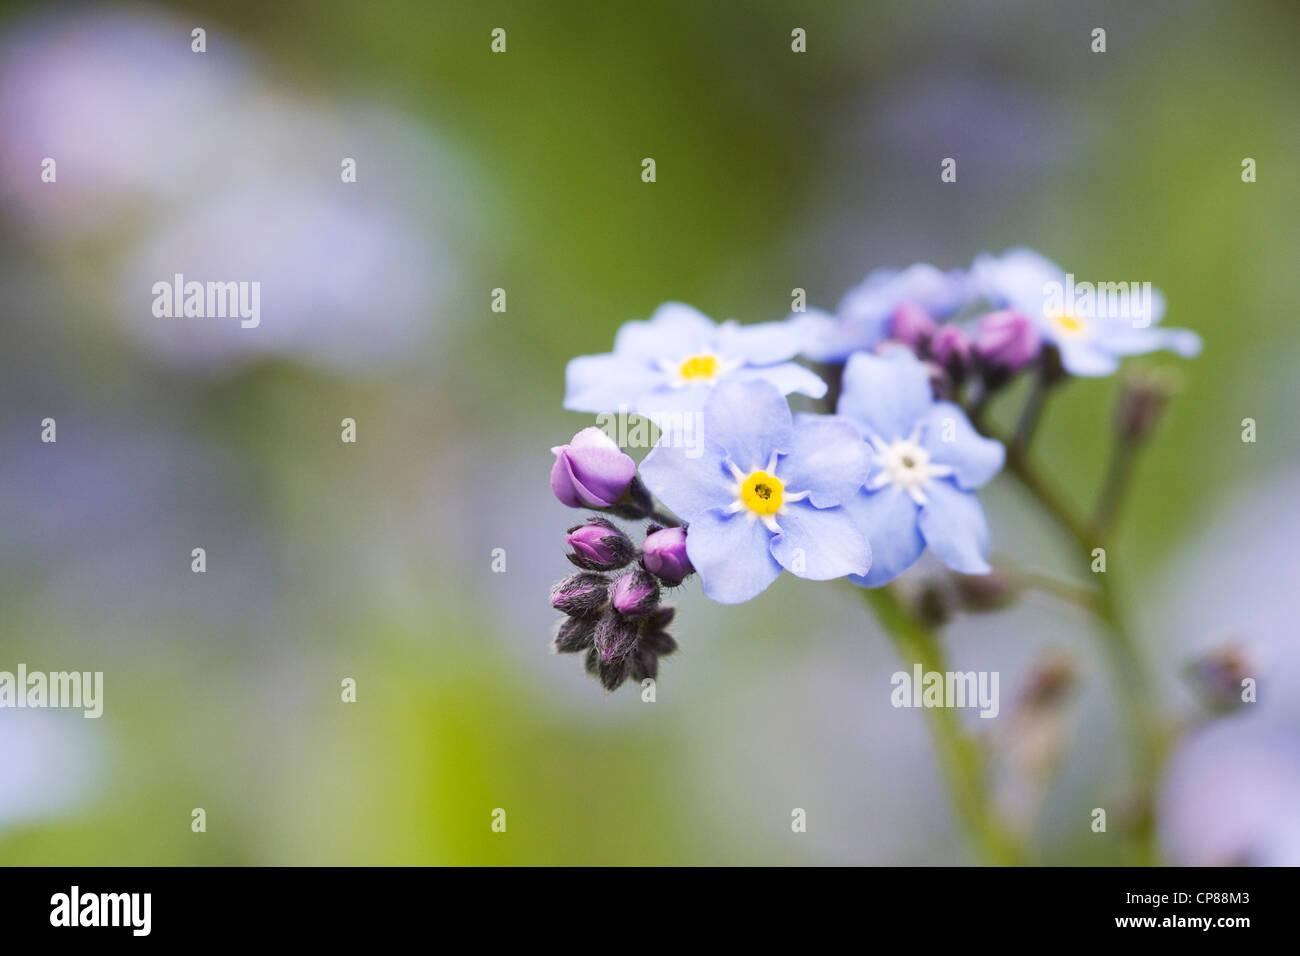 Myosotis sylvatica . Forget me not in an English garden. - Stock Image